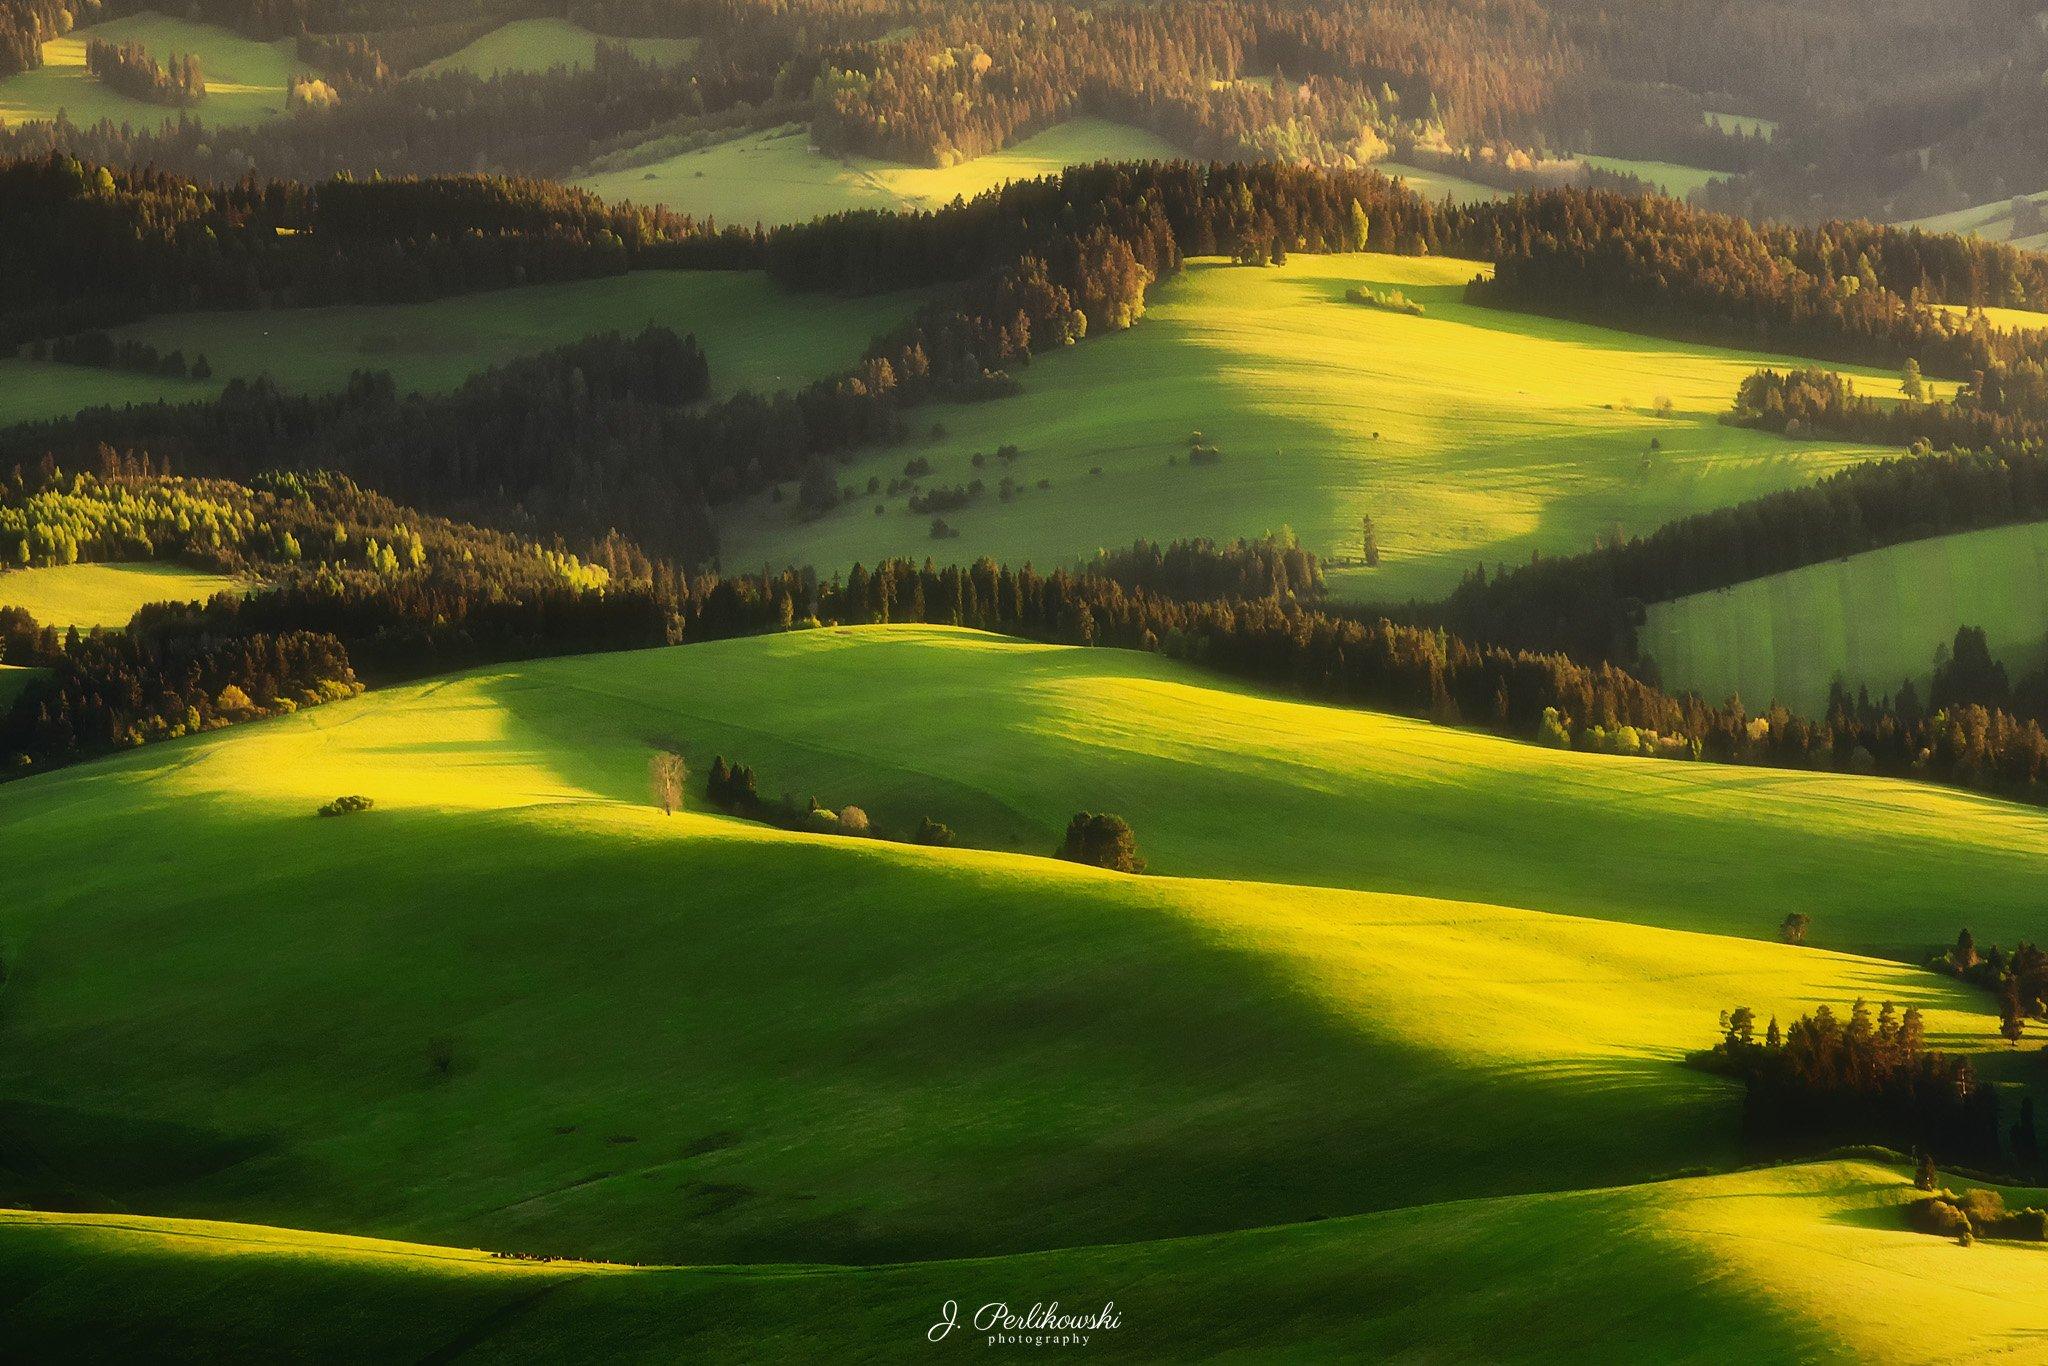 spring, fields, gold, mountains, hills, green, light,, Perlikowski Jakub